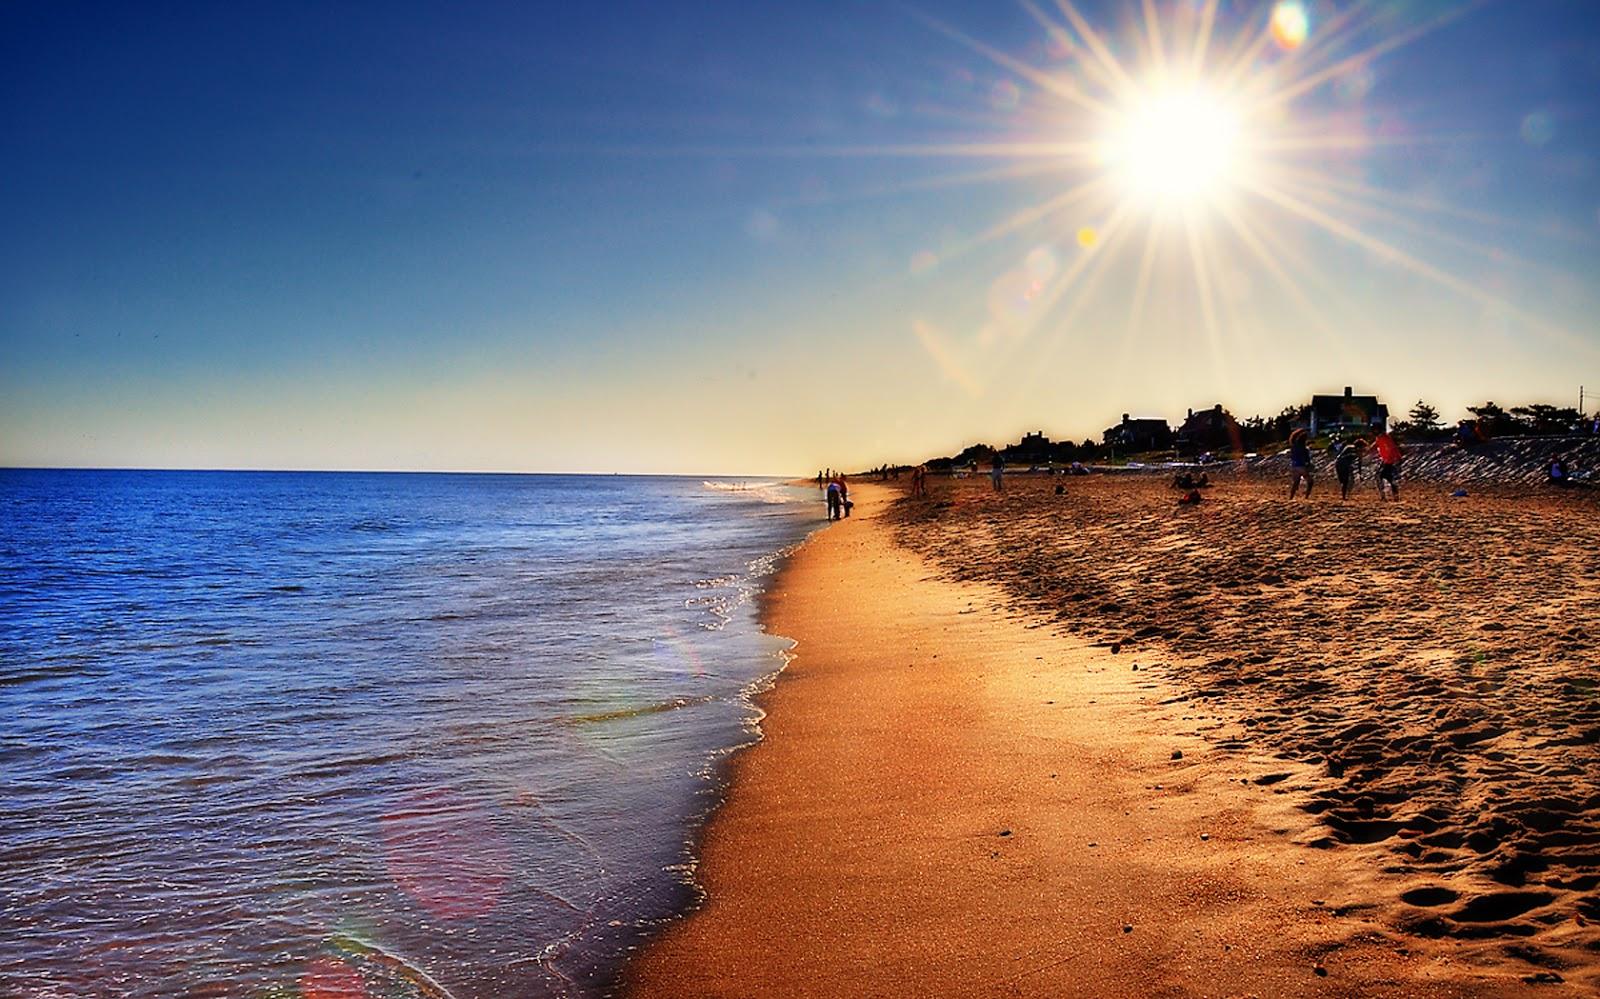 New York's The Hamptons Beach